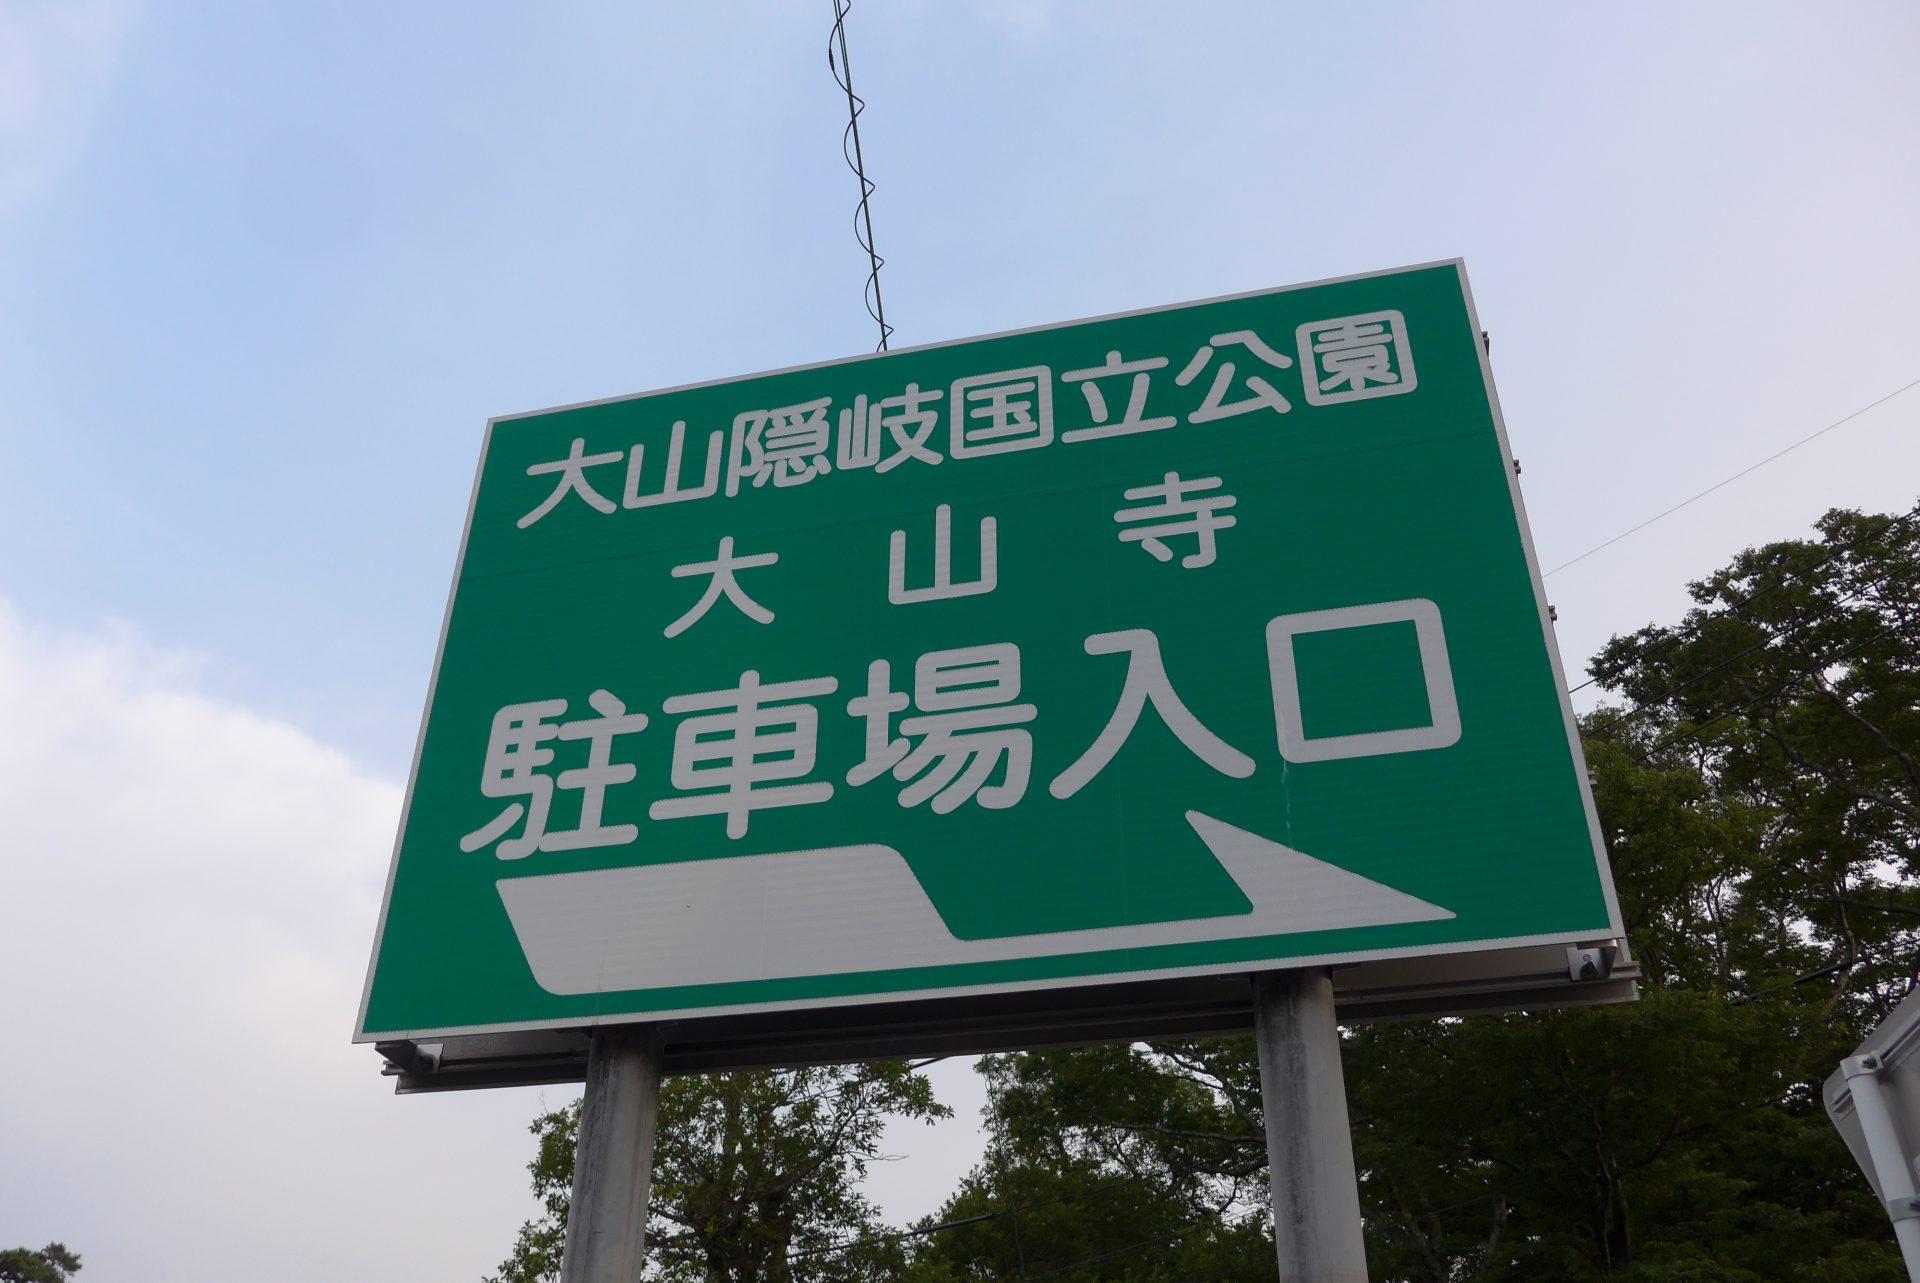 (K)県営大山第4駐車場(博労座駐車場)の車中泊!料金無料期間に